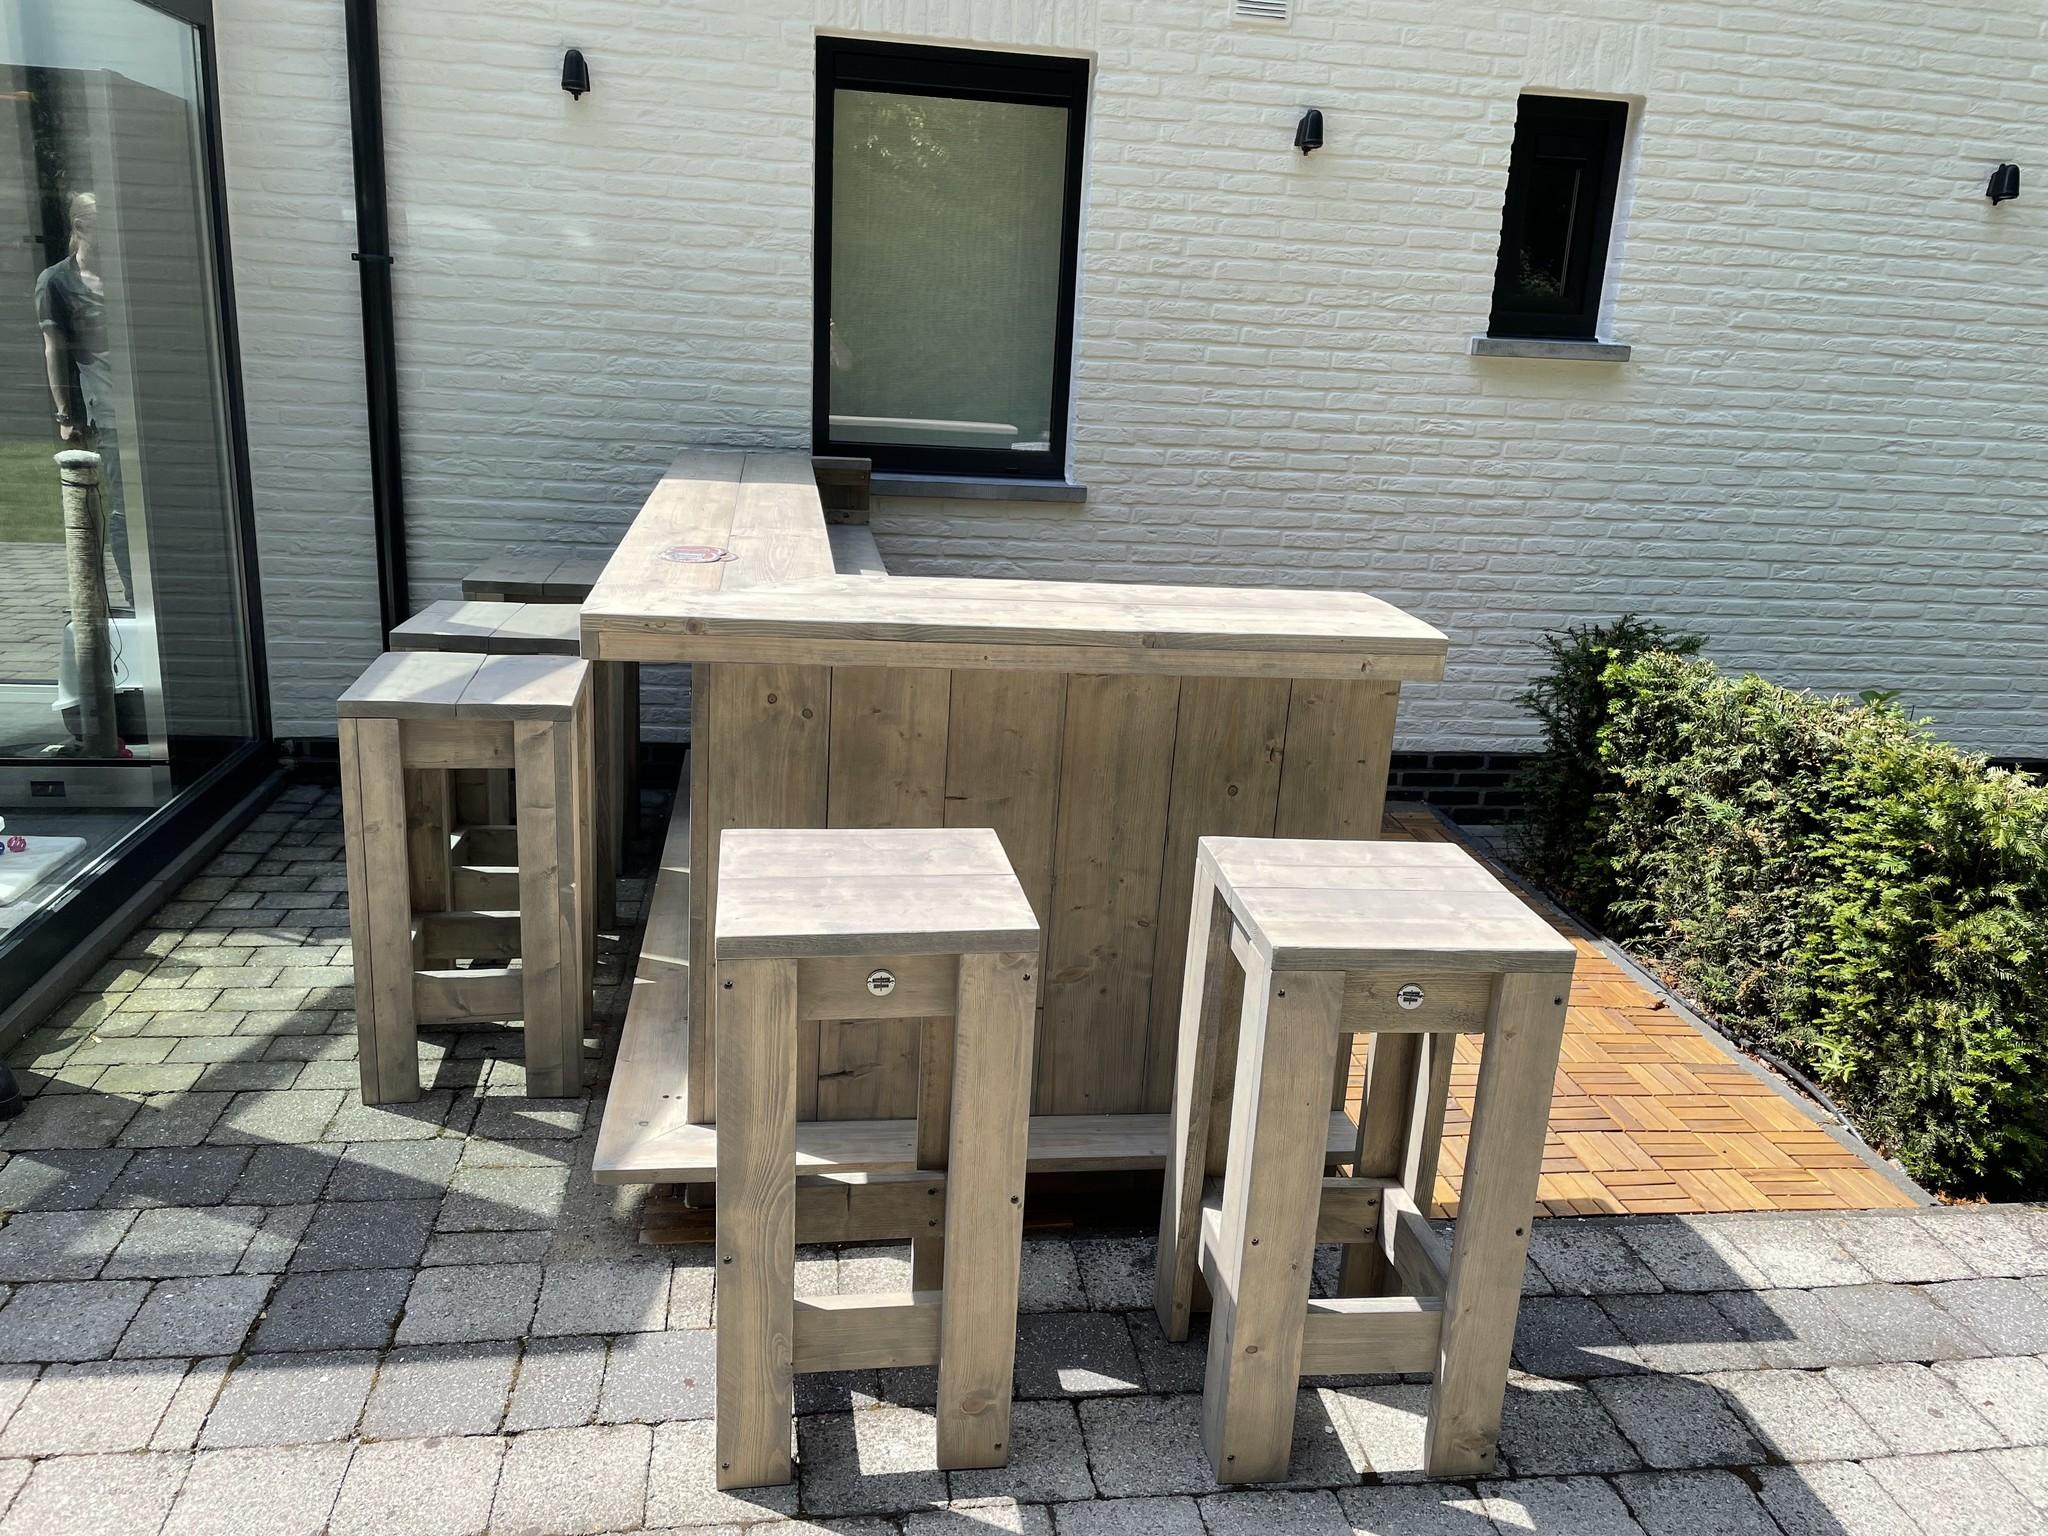 Everton XL Bar / Balie / Toonbank van steigerhout: Model  Everton  XL